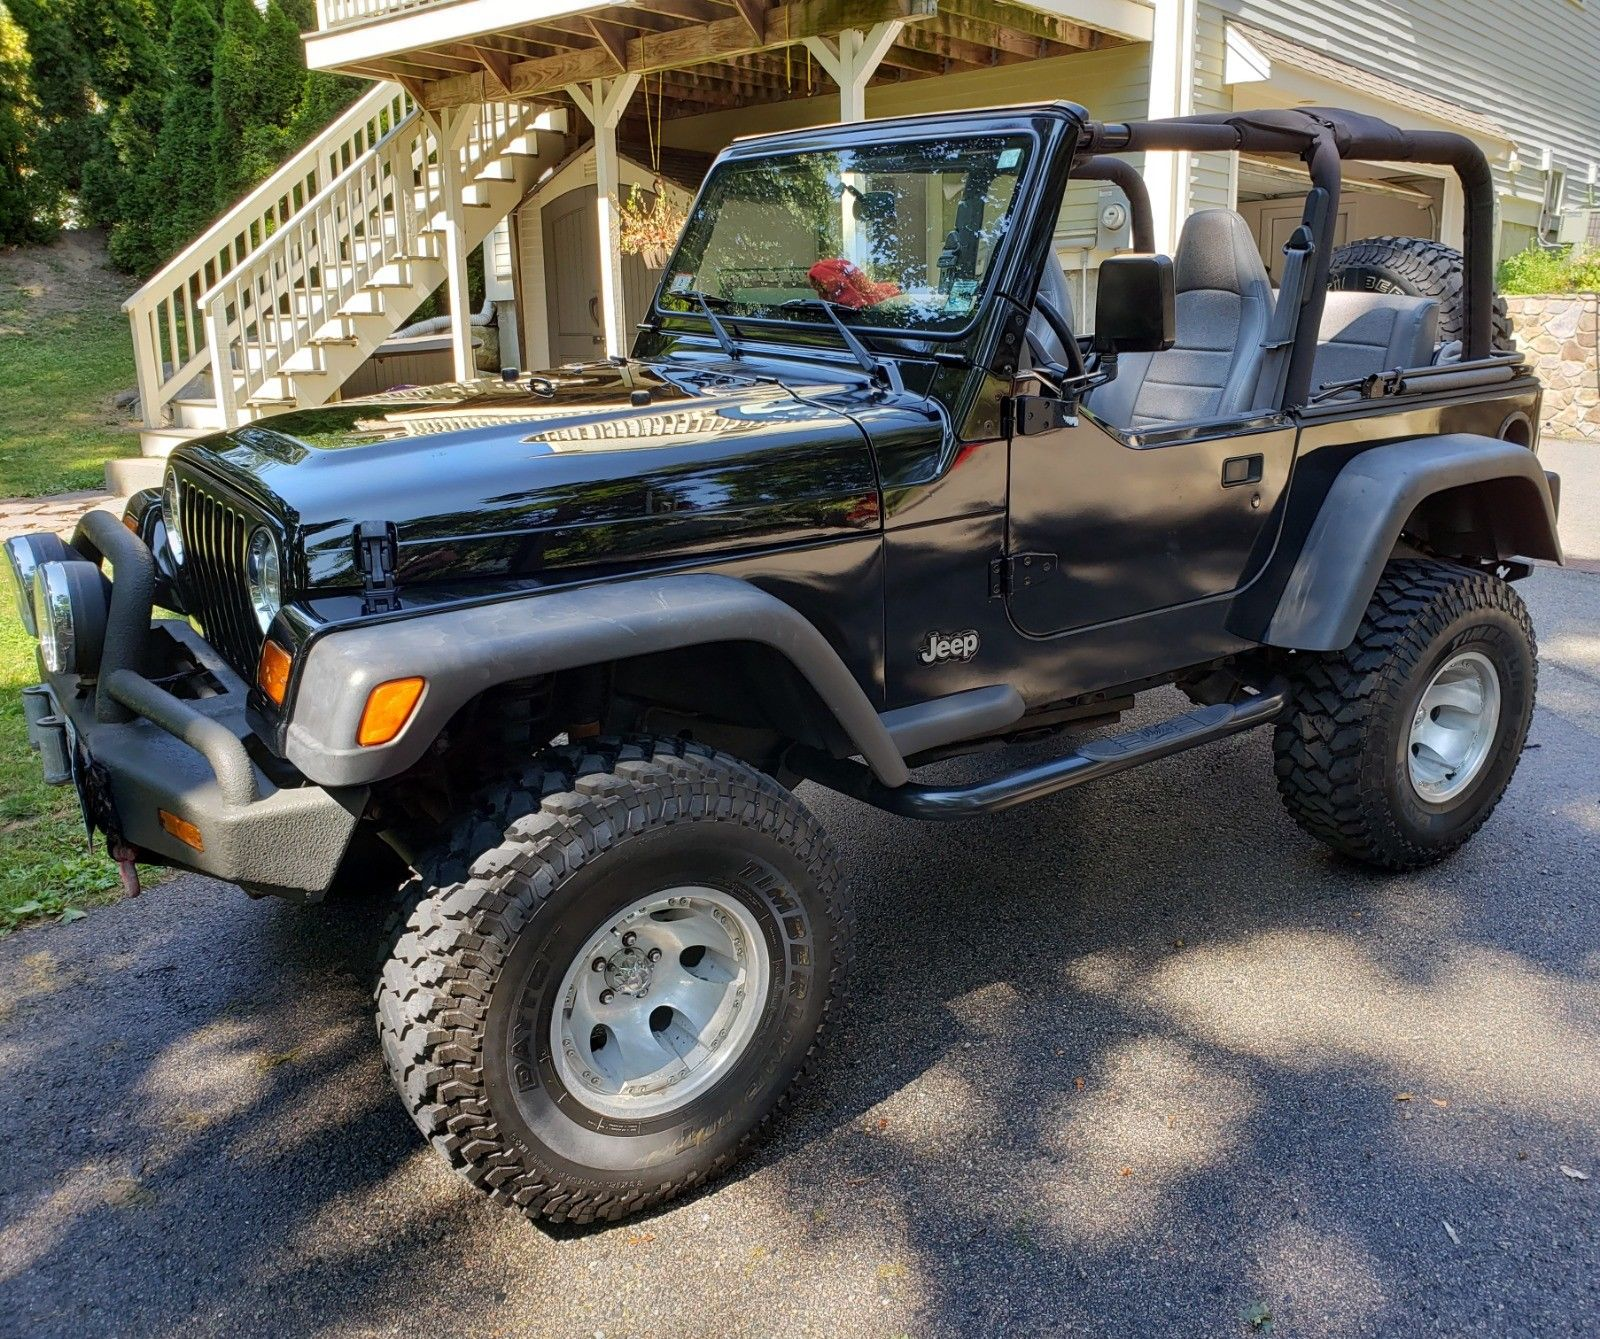 Amazing 1998 Jeep Wrangler TJ Jeep Wrangler TJ 1998 2019